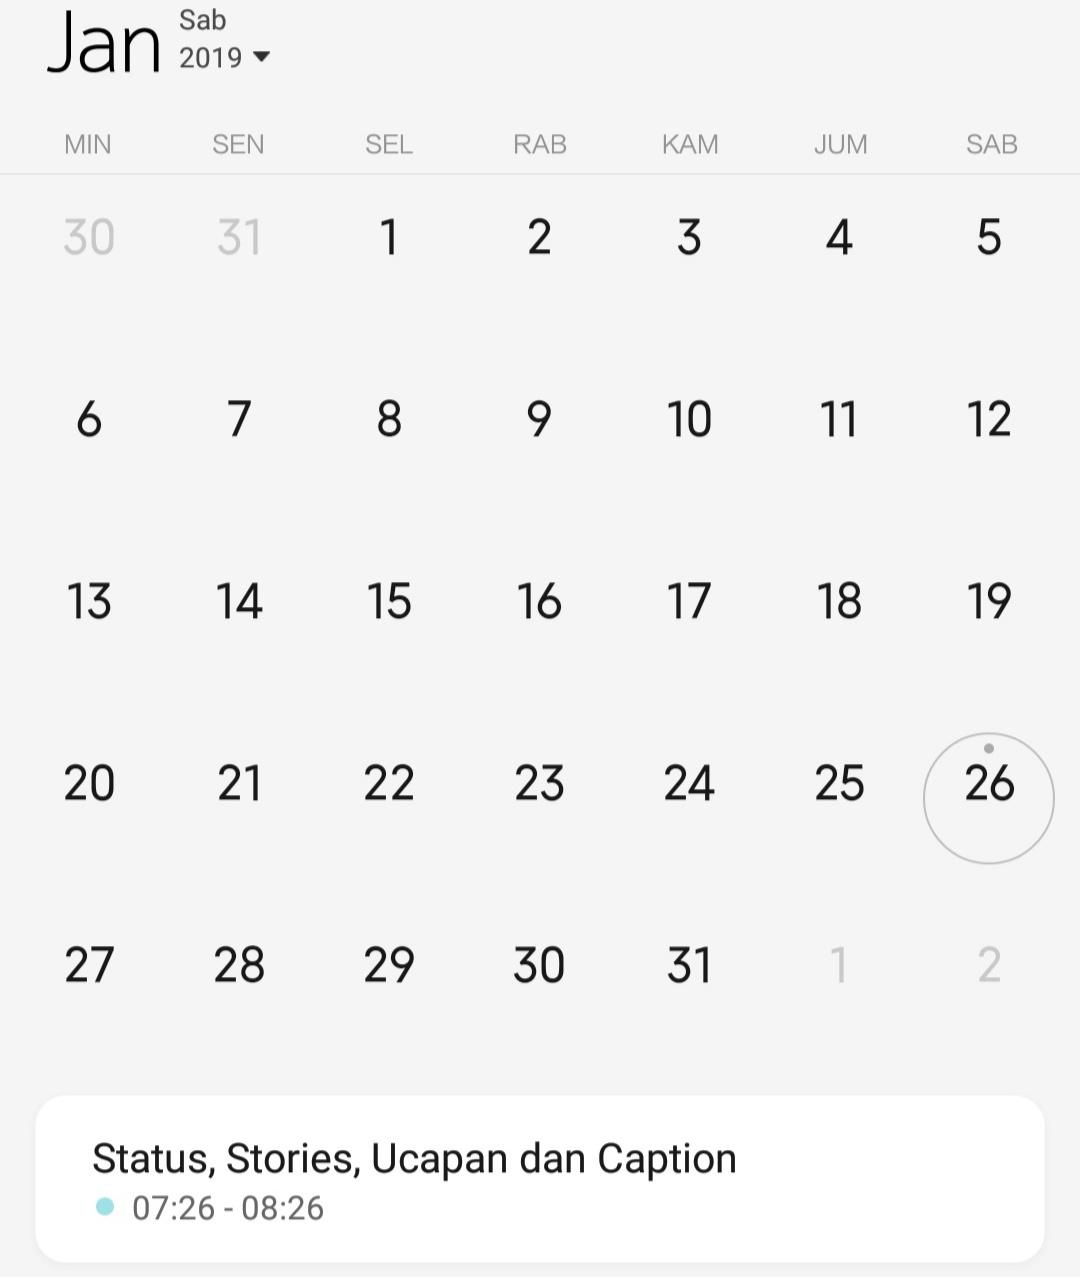 Kumpulan Kata Bulan Januari untuk Status, Stories dan Caption Terbaru